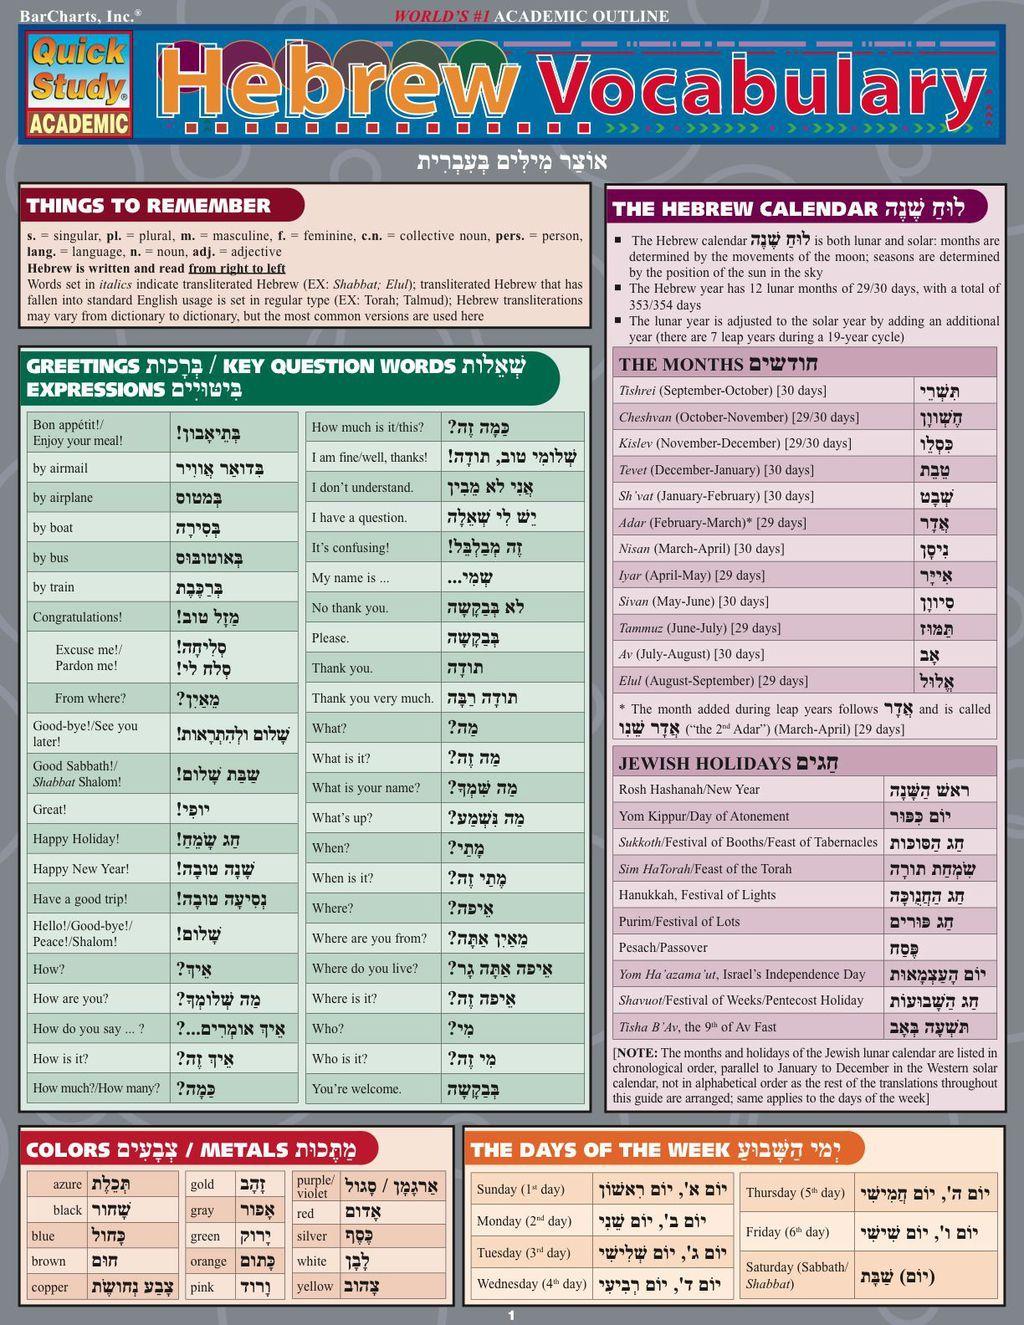 Hebrew Vocabulary Ebook